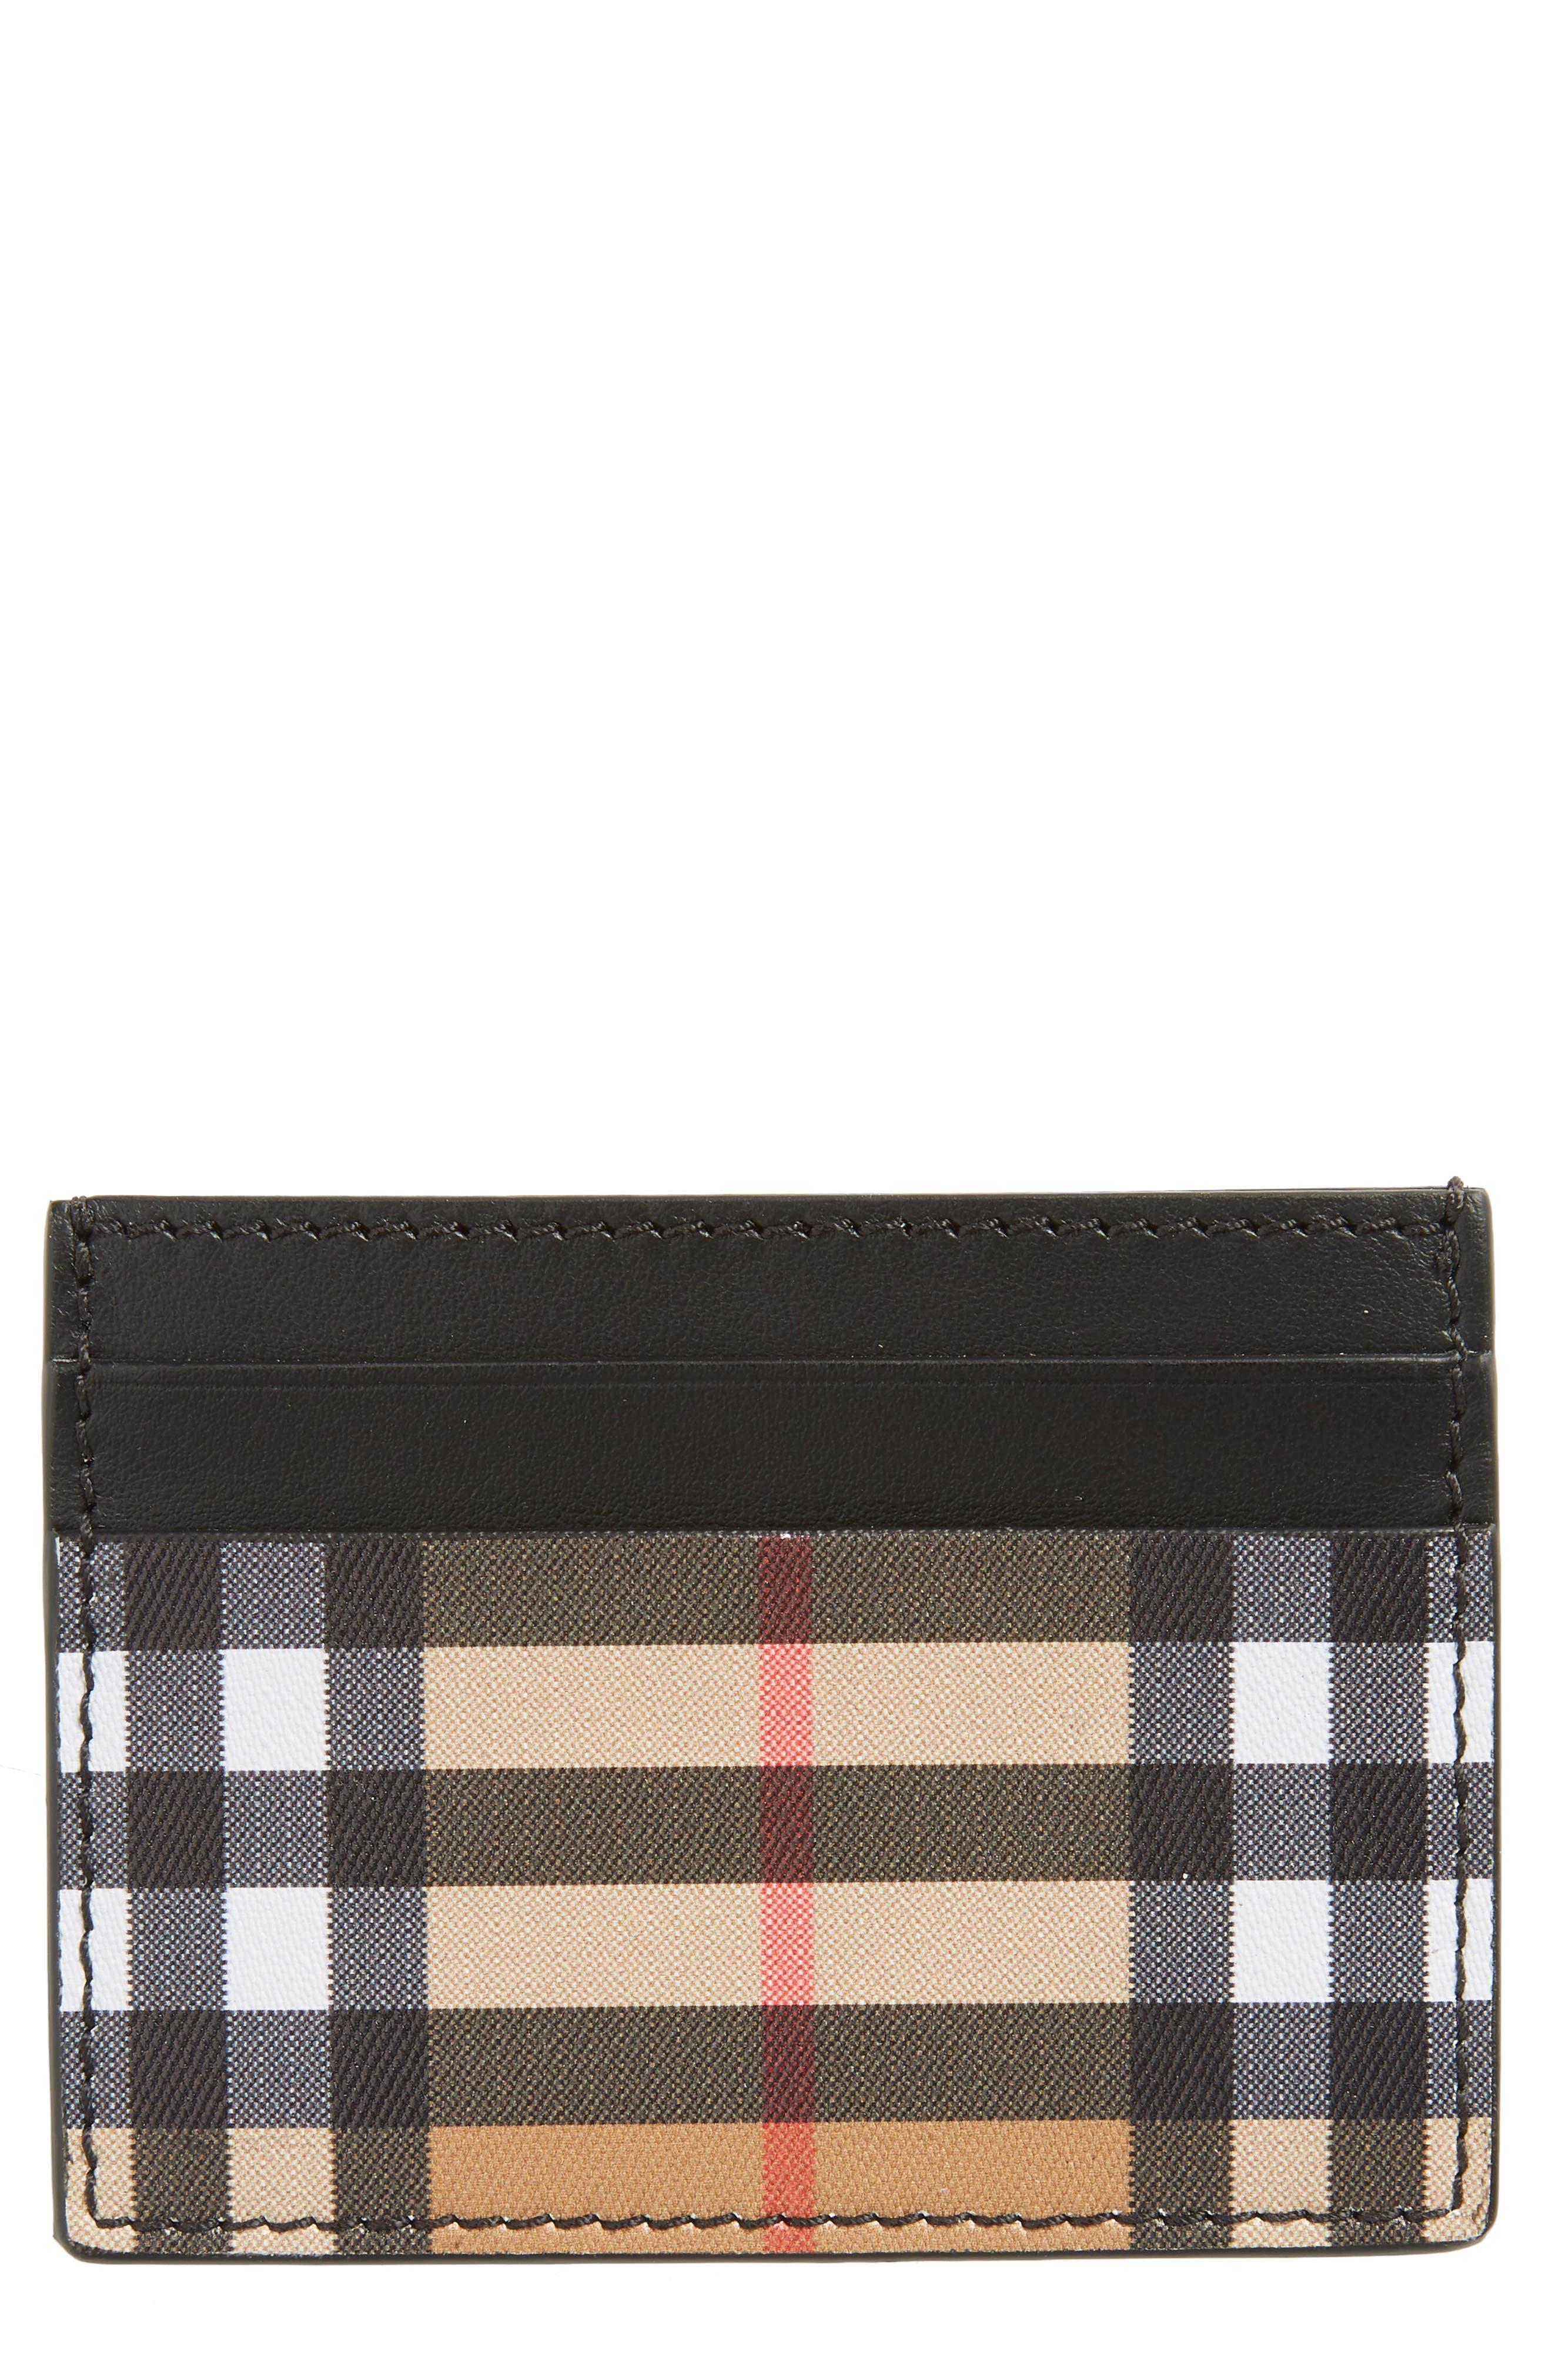 Burberry Sandon Vintage Check Leather Card Case